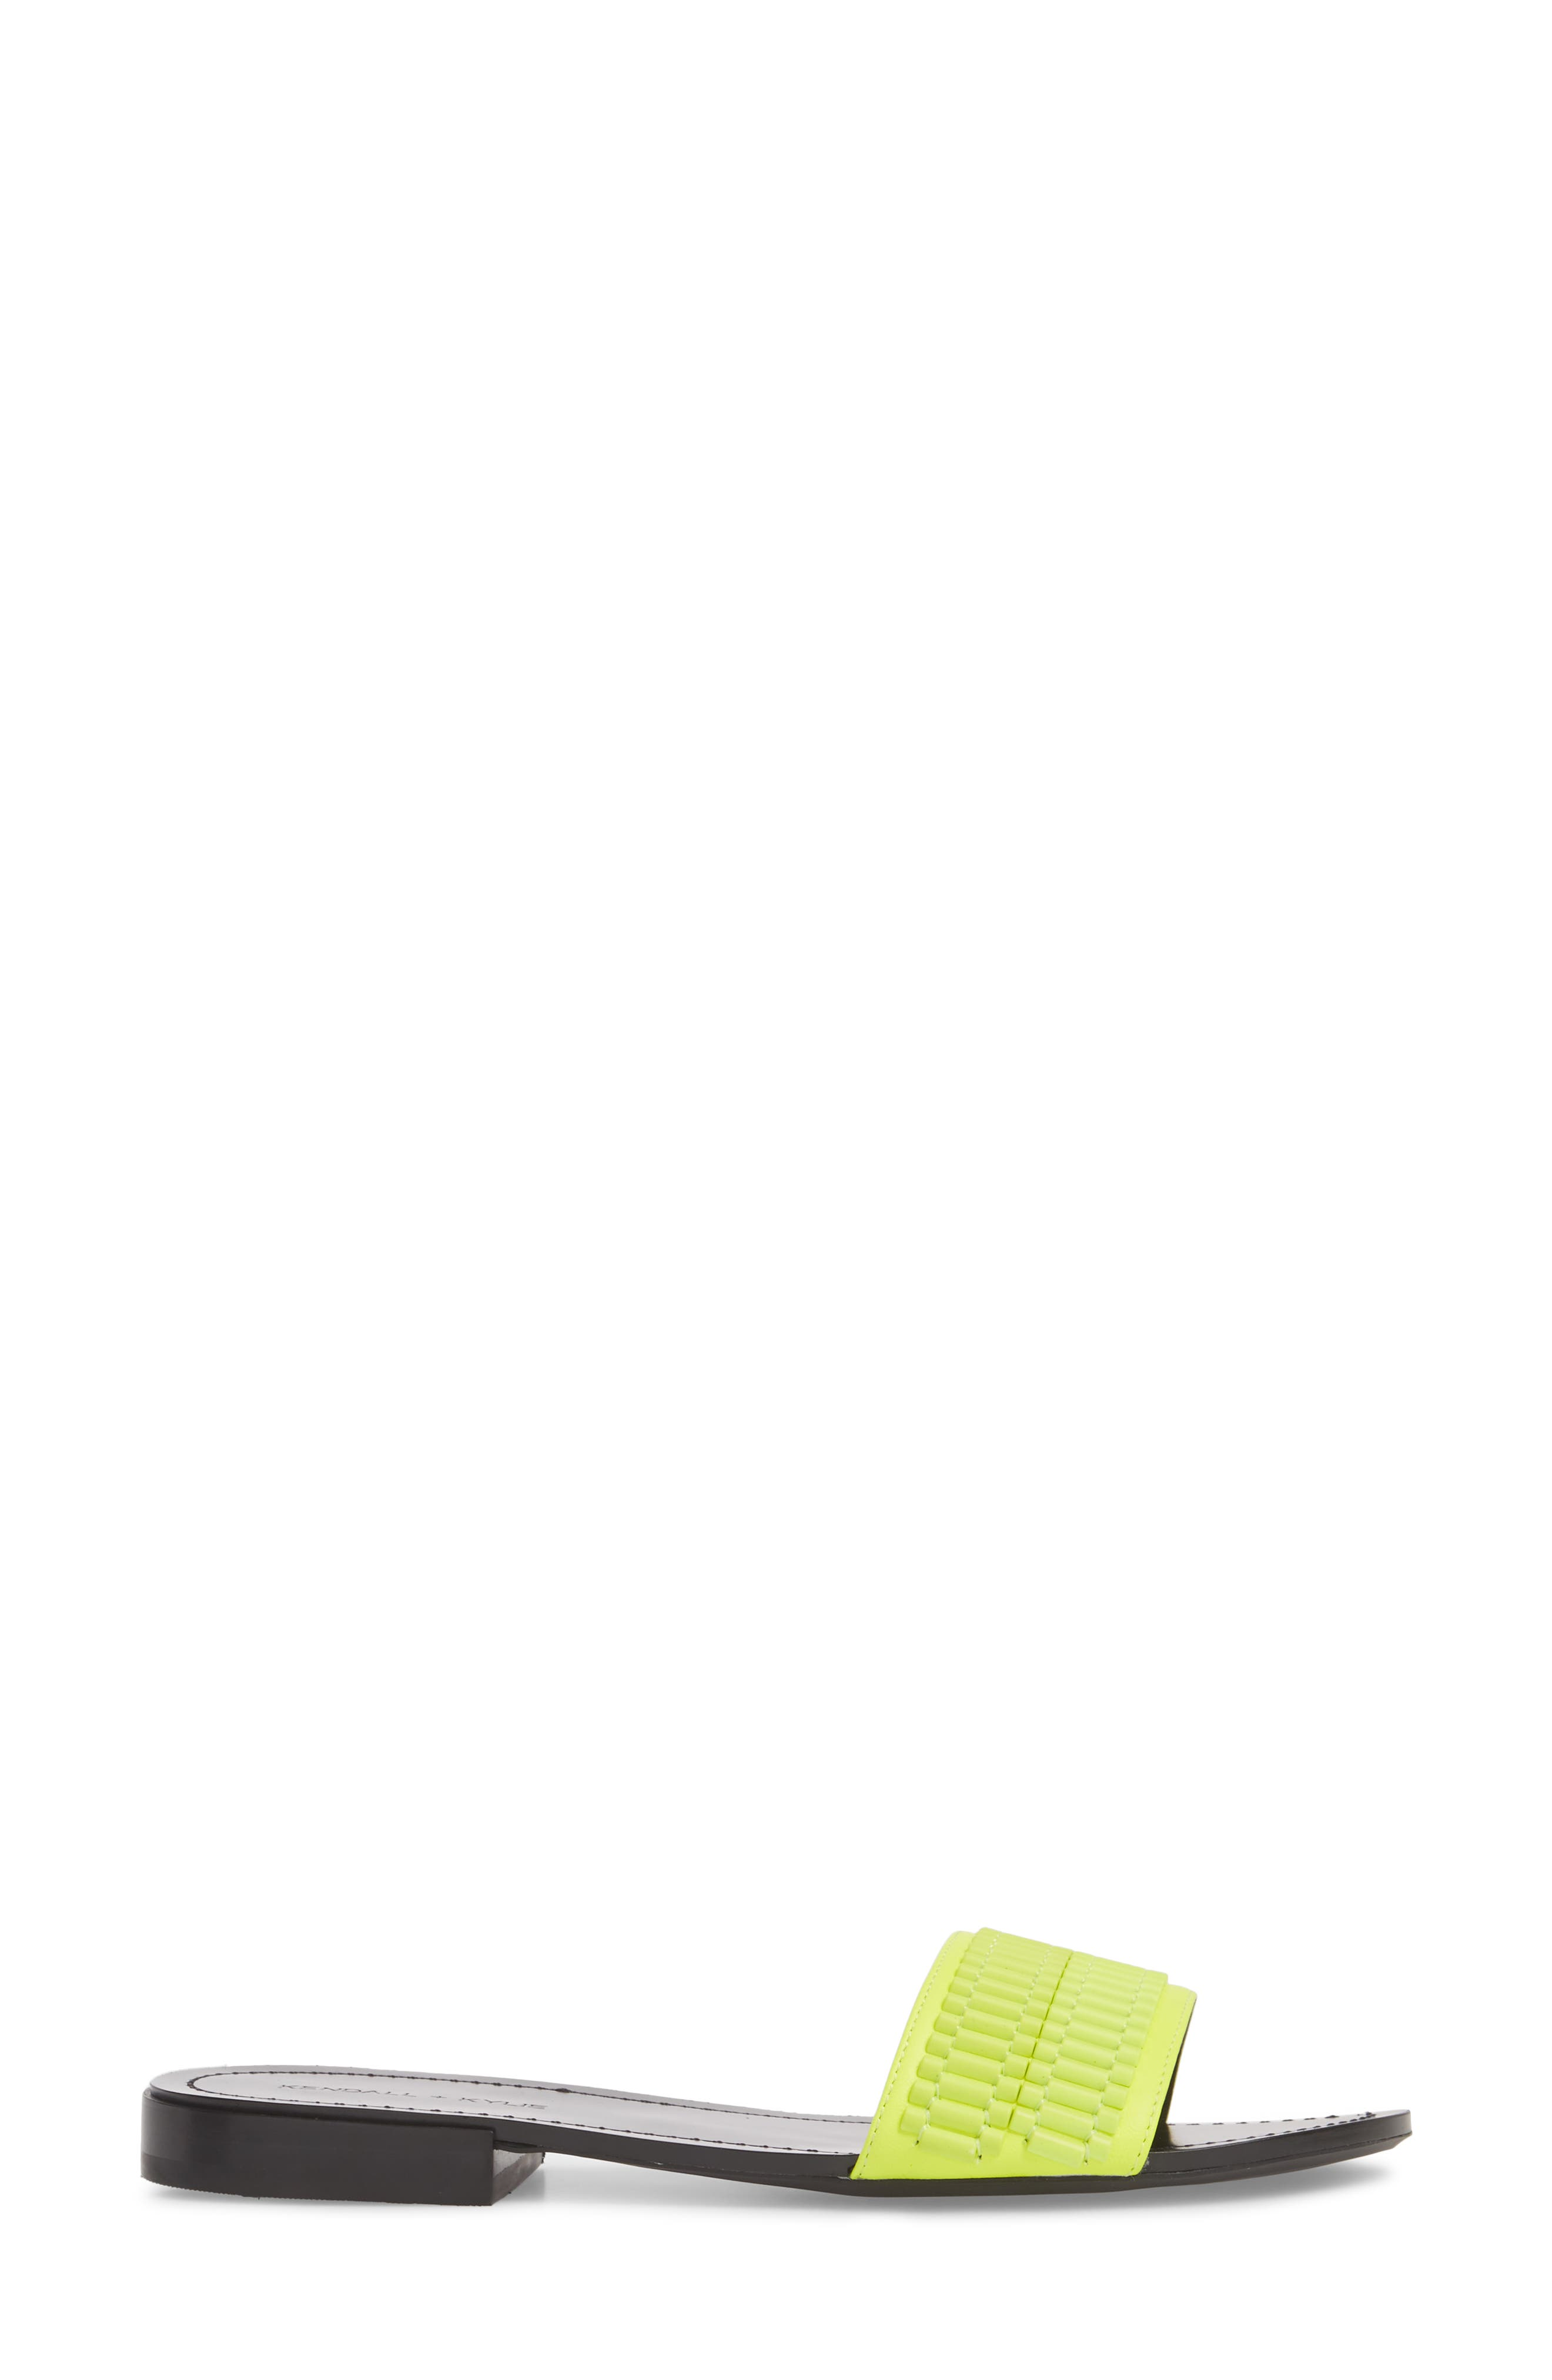 Kennedy Slide Sandal,                             Alternate thumbnail 3, color,                             Fluorescent Yellow/ Yellow